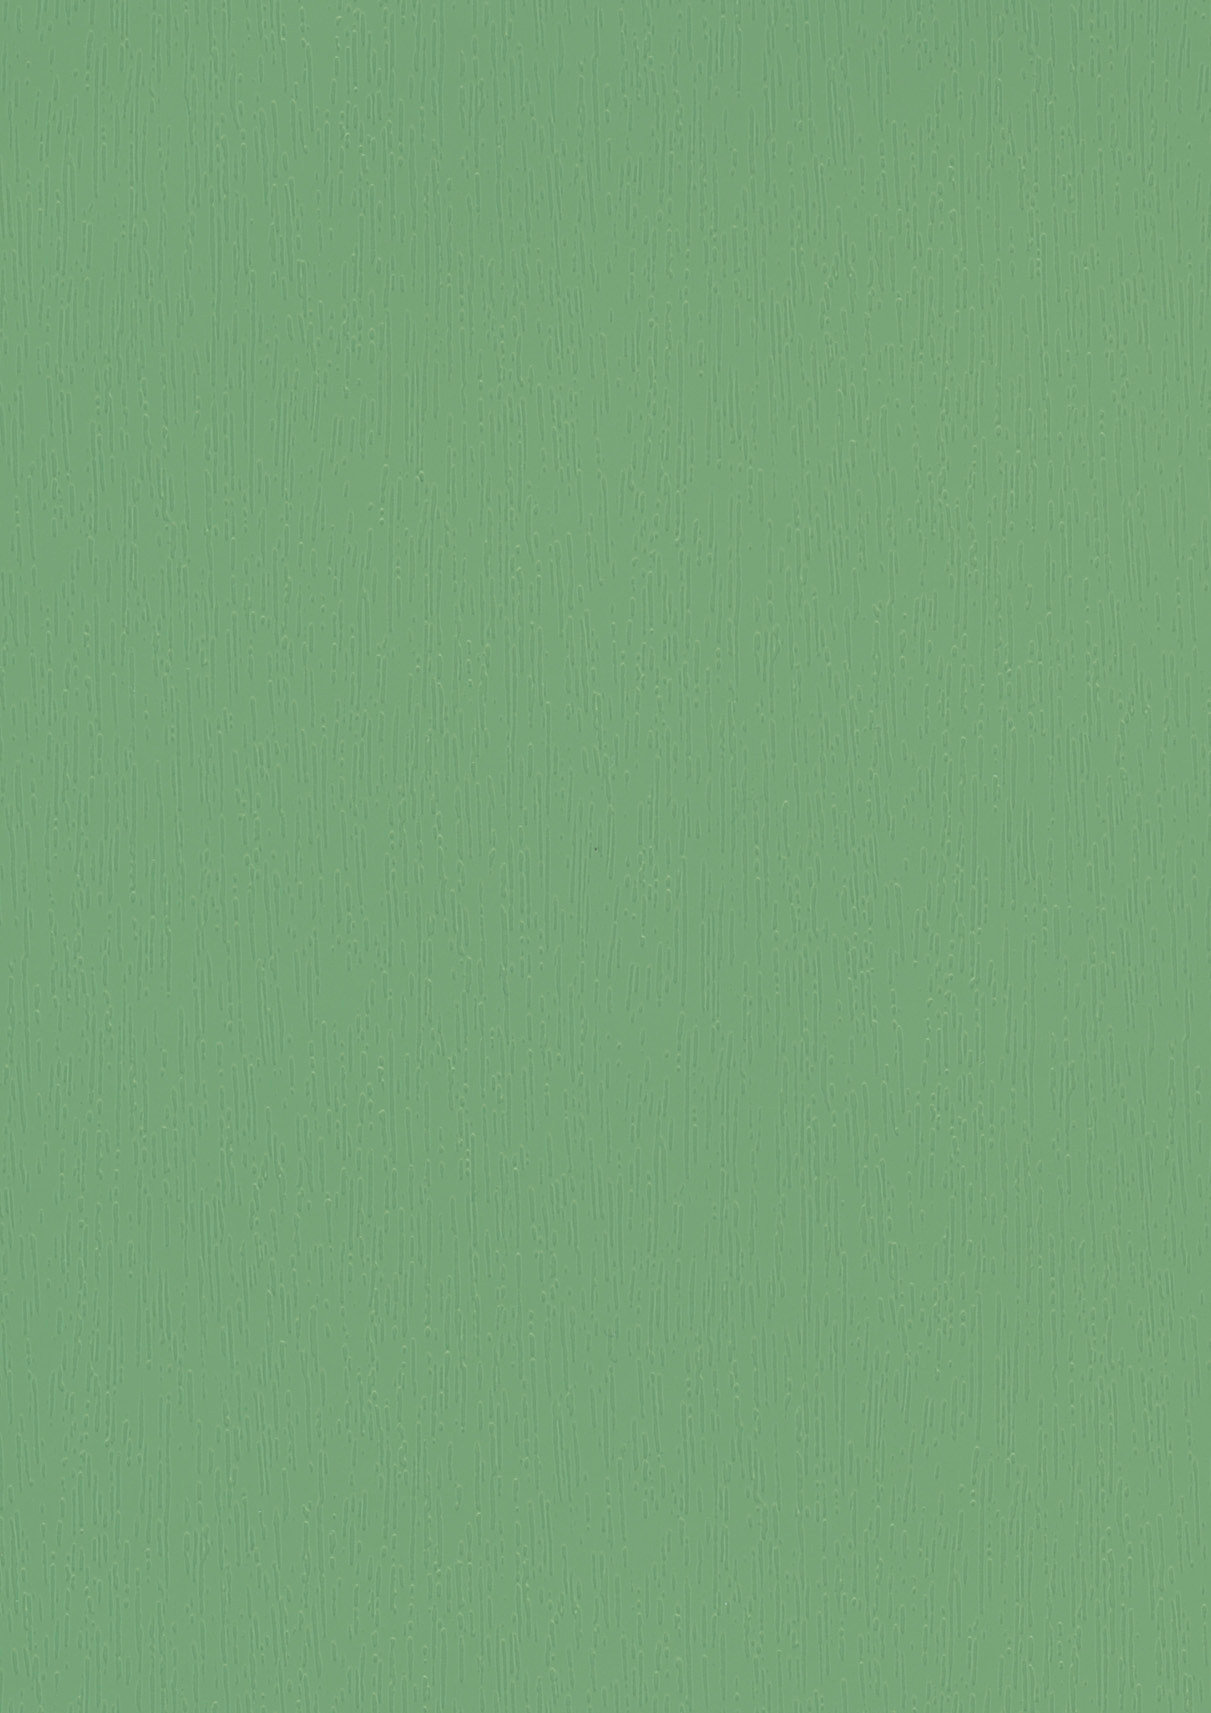 Verde salvia gray la scelta giusta variata sul design - Bagno verde salvia ...